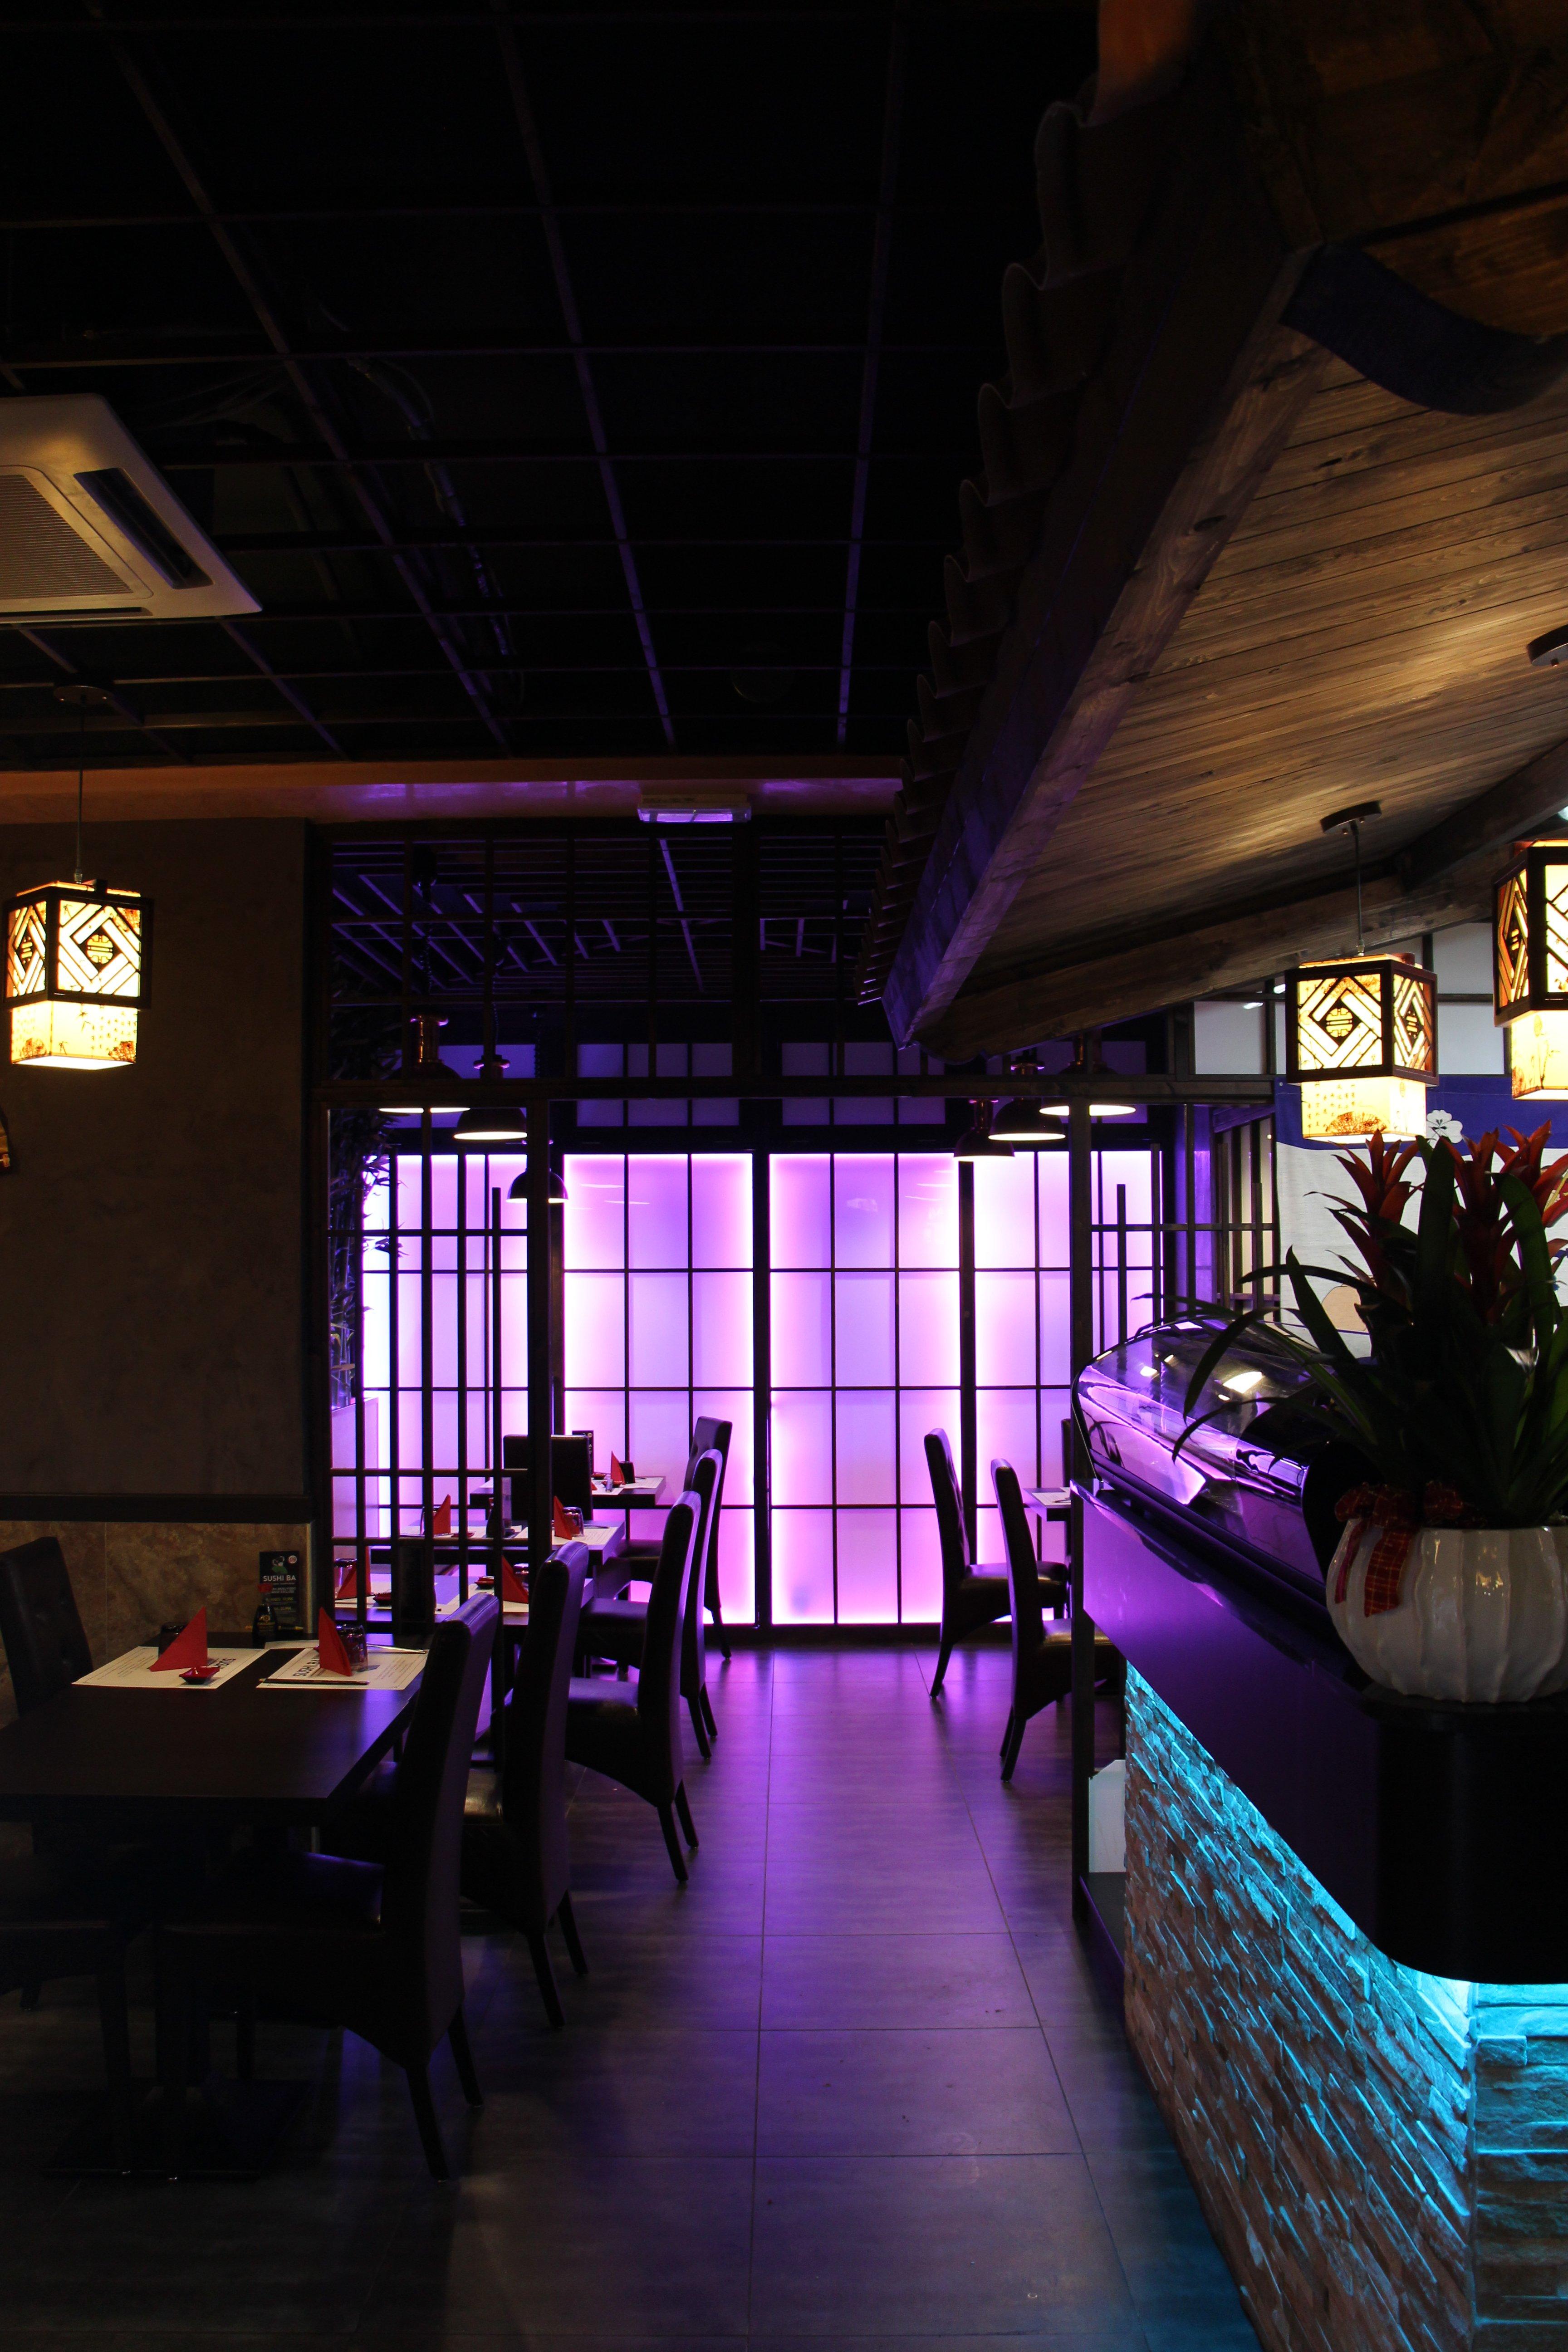 tavoli ed interni del ristorante Sushi.BA